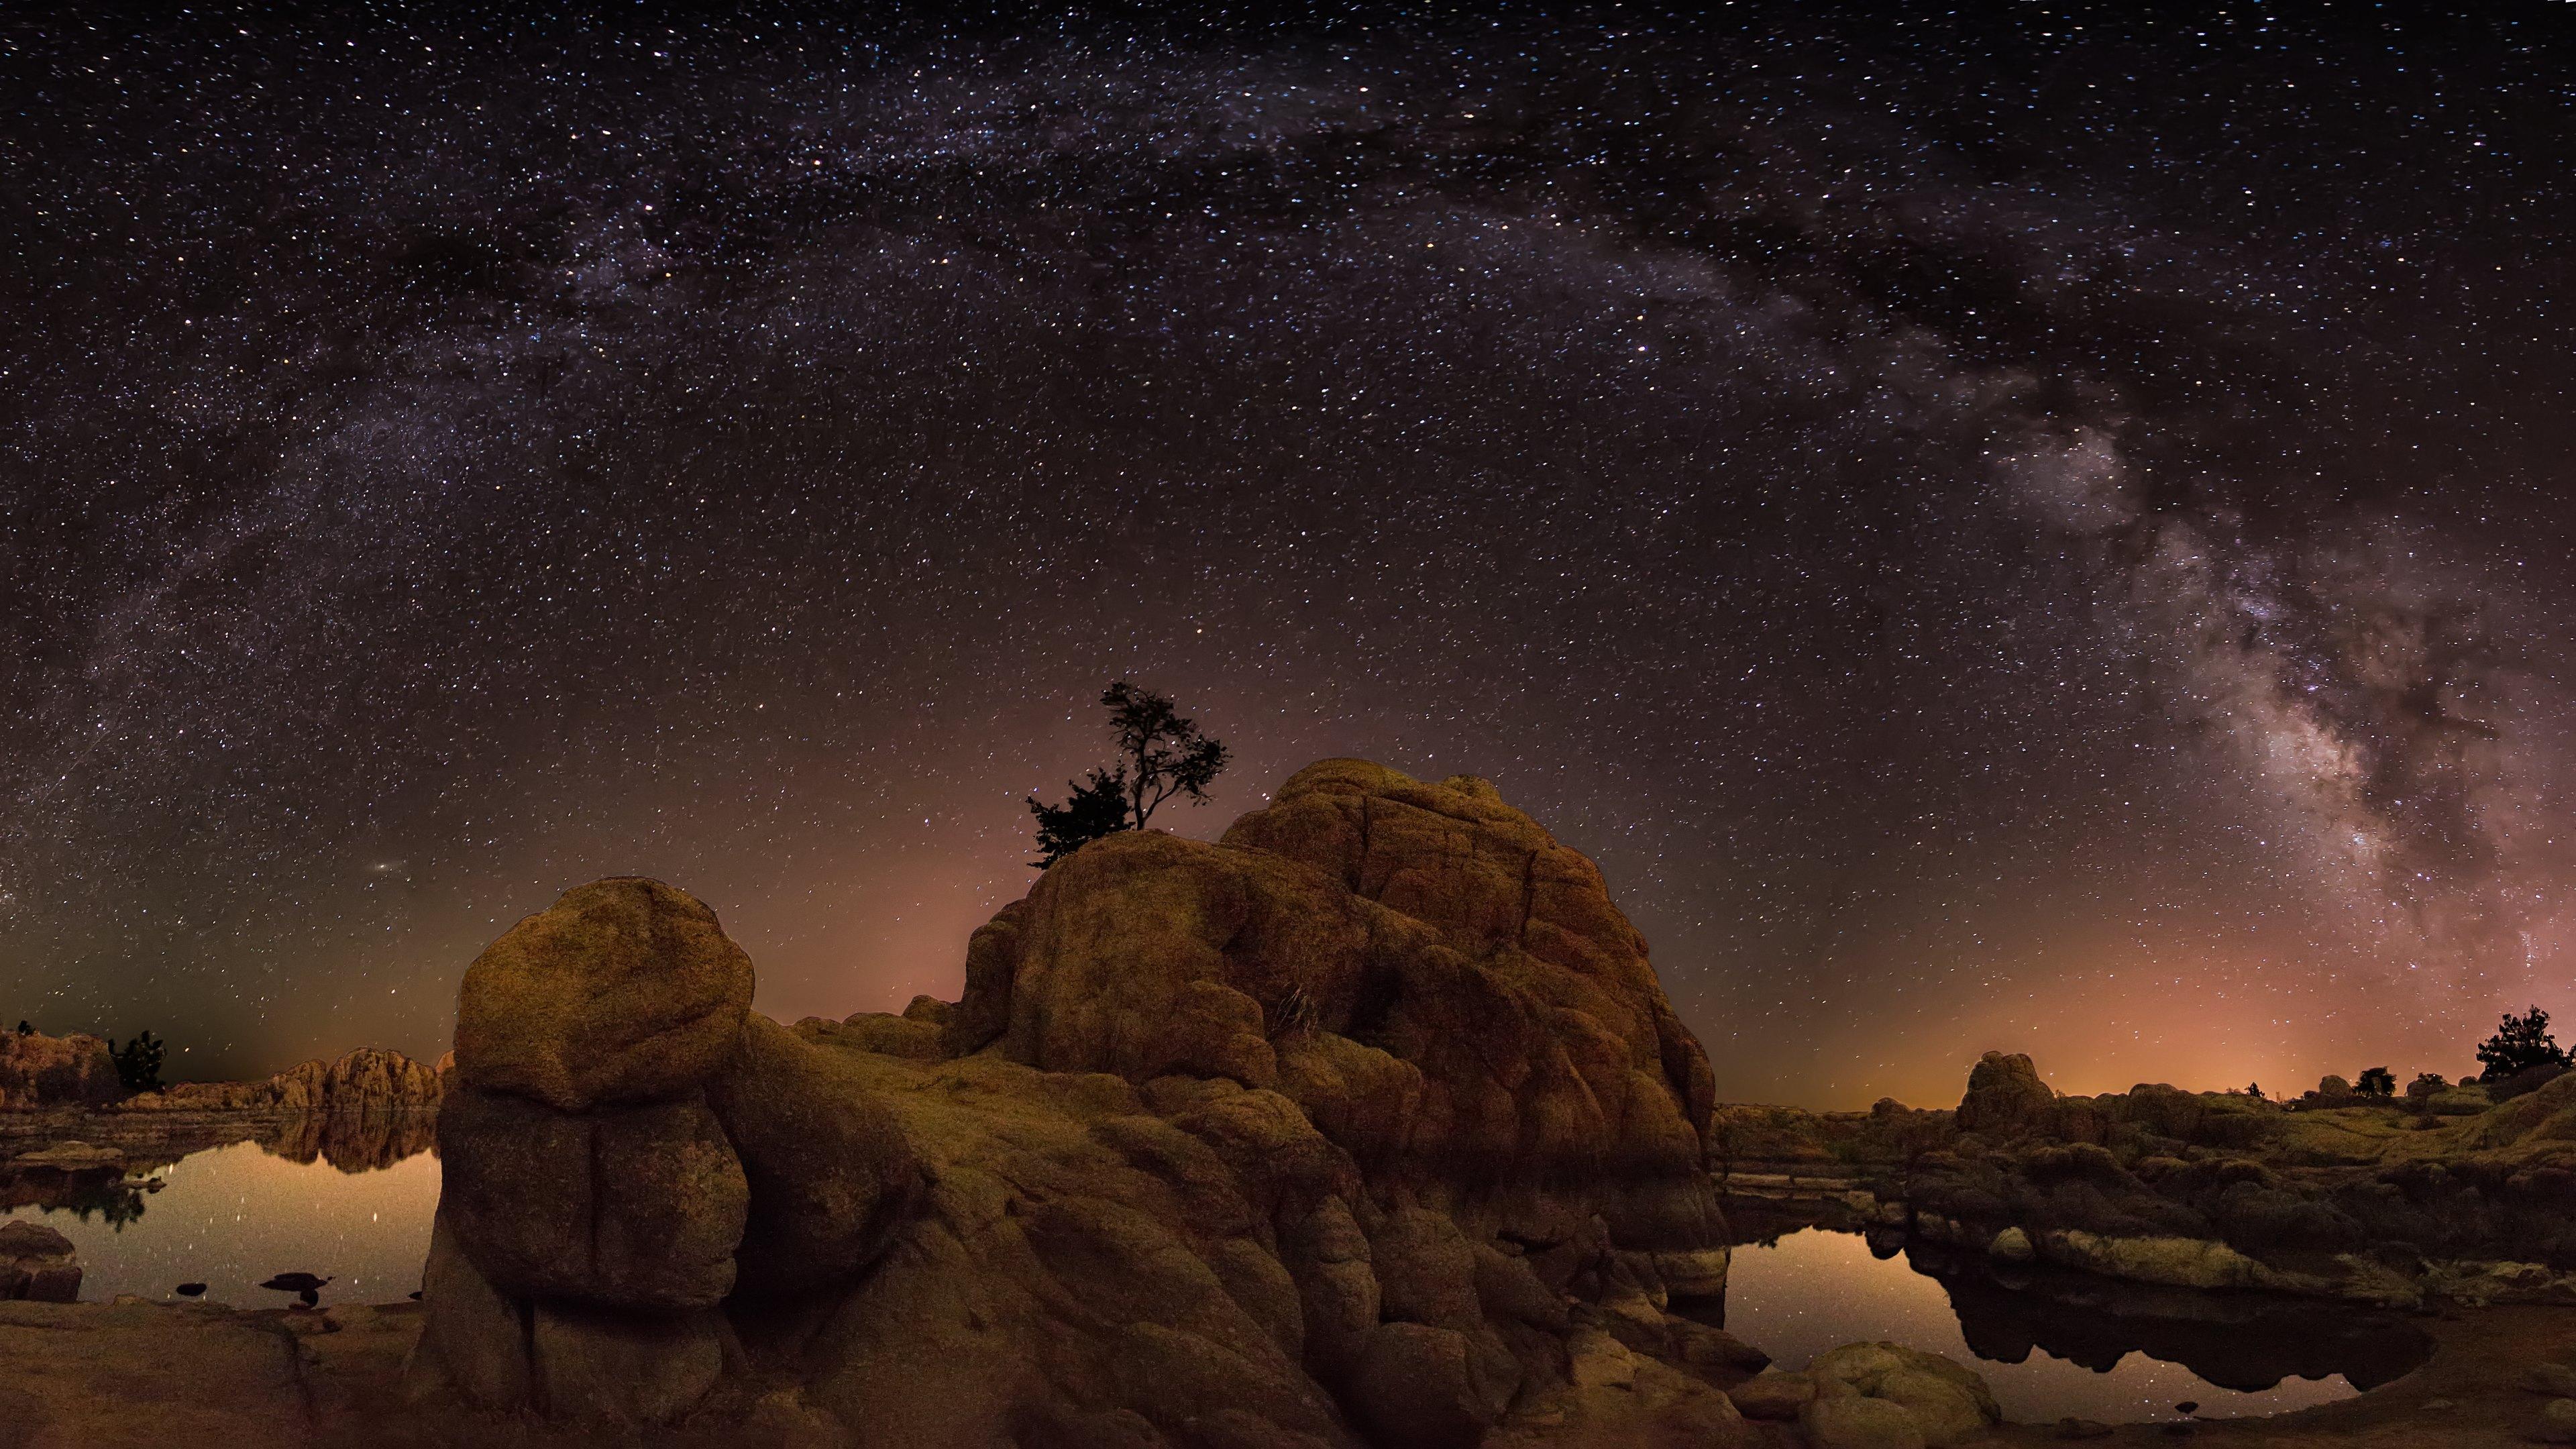 Milky Way 2014 Wallpapers HD Wallpapers 3840x2160